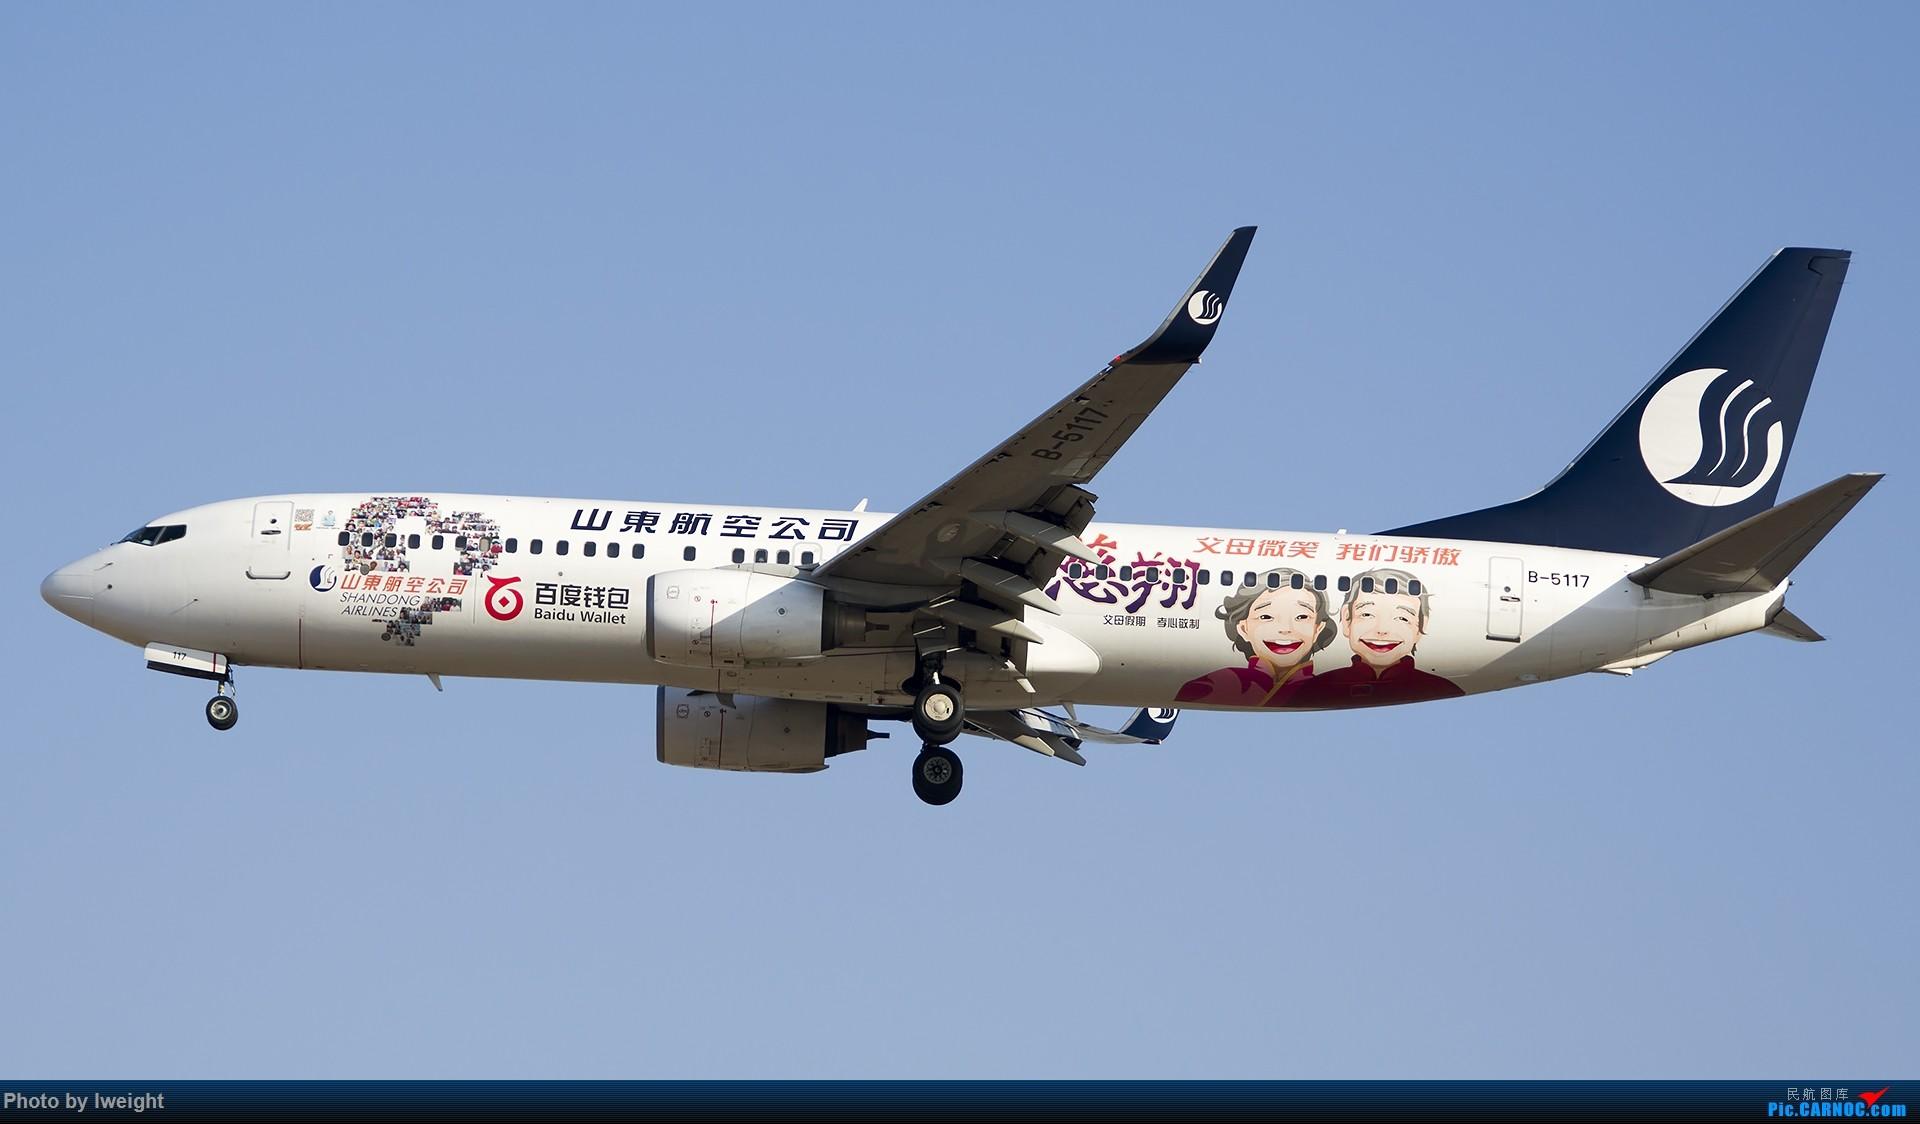 Re:[原创]庆祝升级777,发上今天在首都机场拍的所有飞机【2014-12-14】 BOEING 737-800 B-5117 中国北京首都国际机场